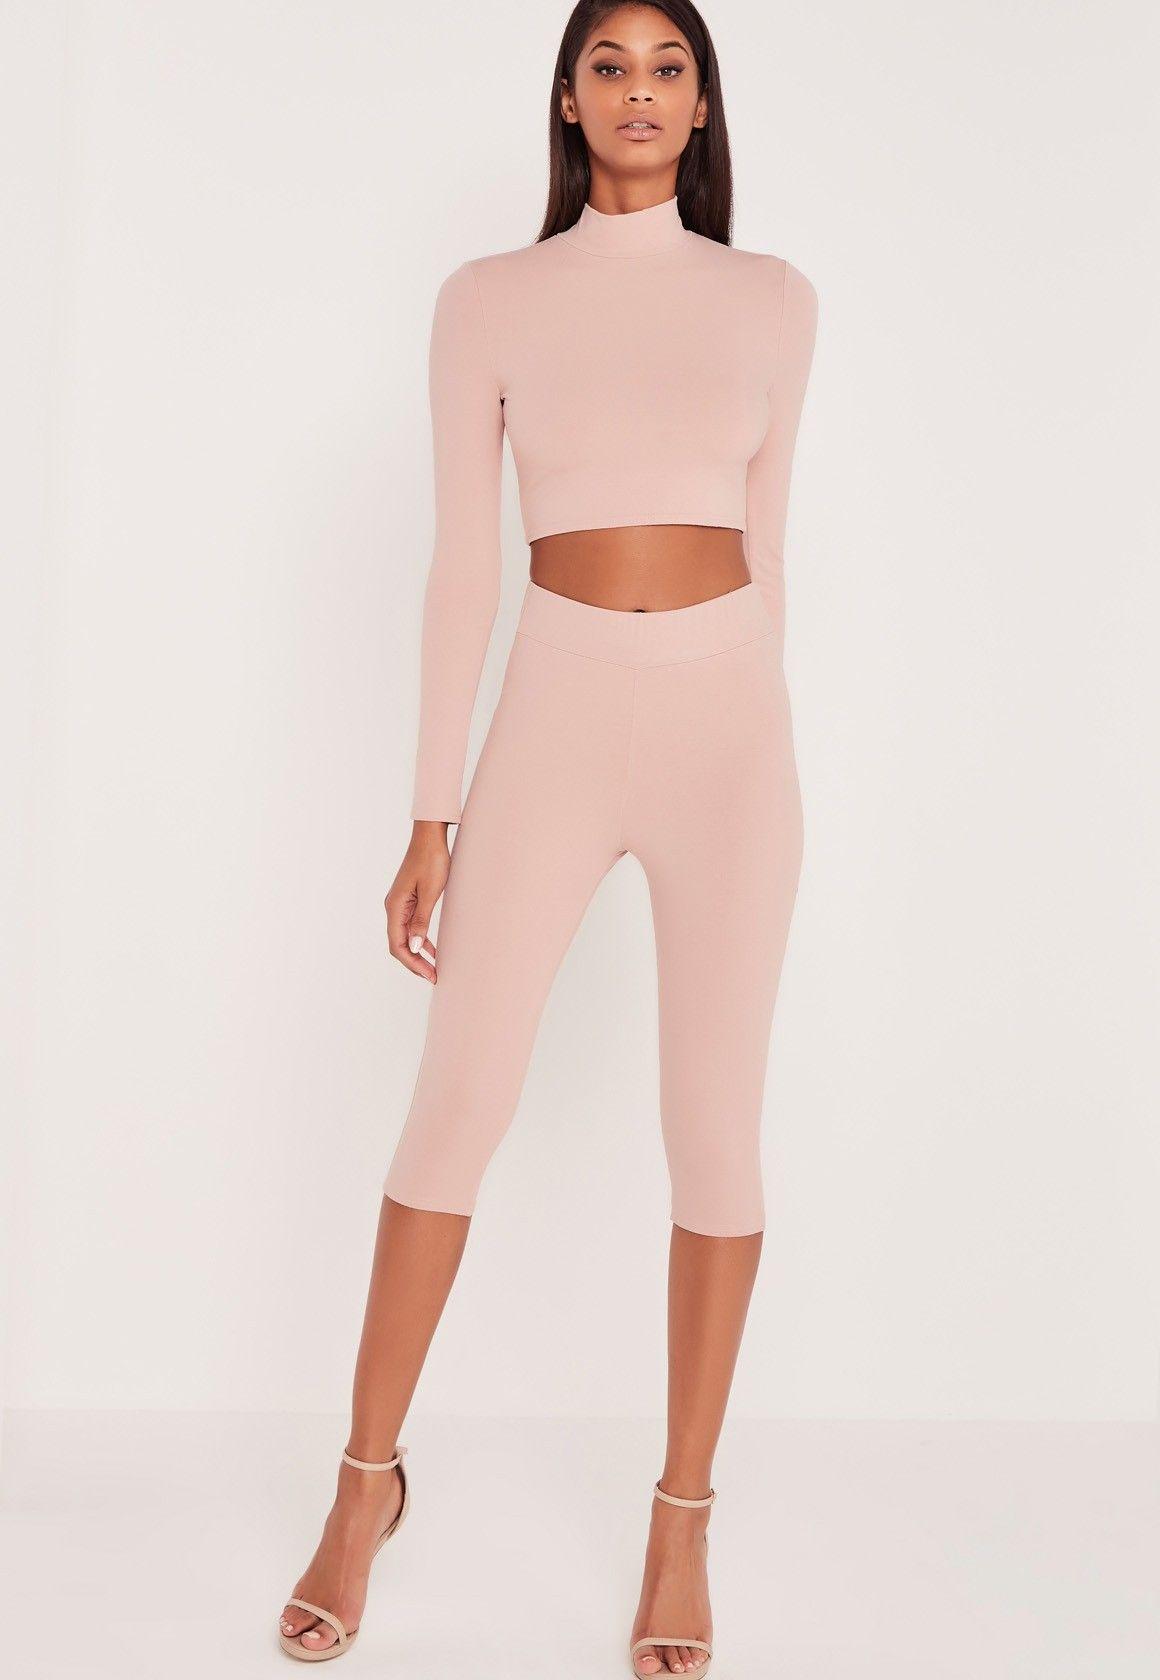 93f1a198f8d24c Missguided - Carli Bybel Cropped Leggings Pink | Wishlist | Pink ...